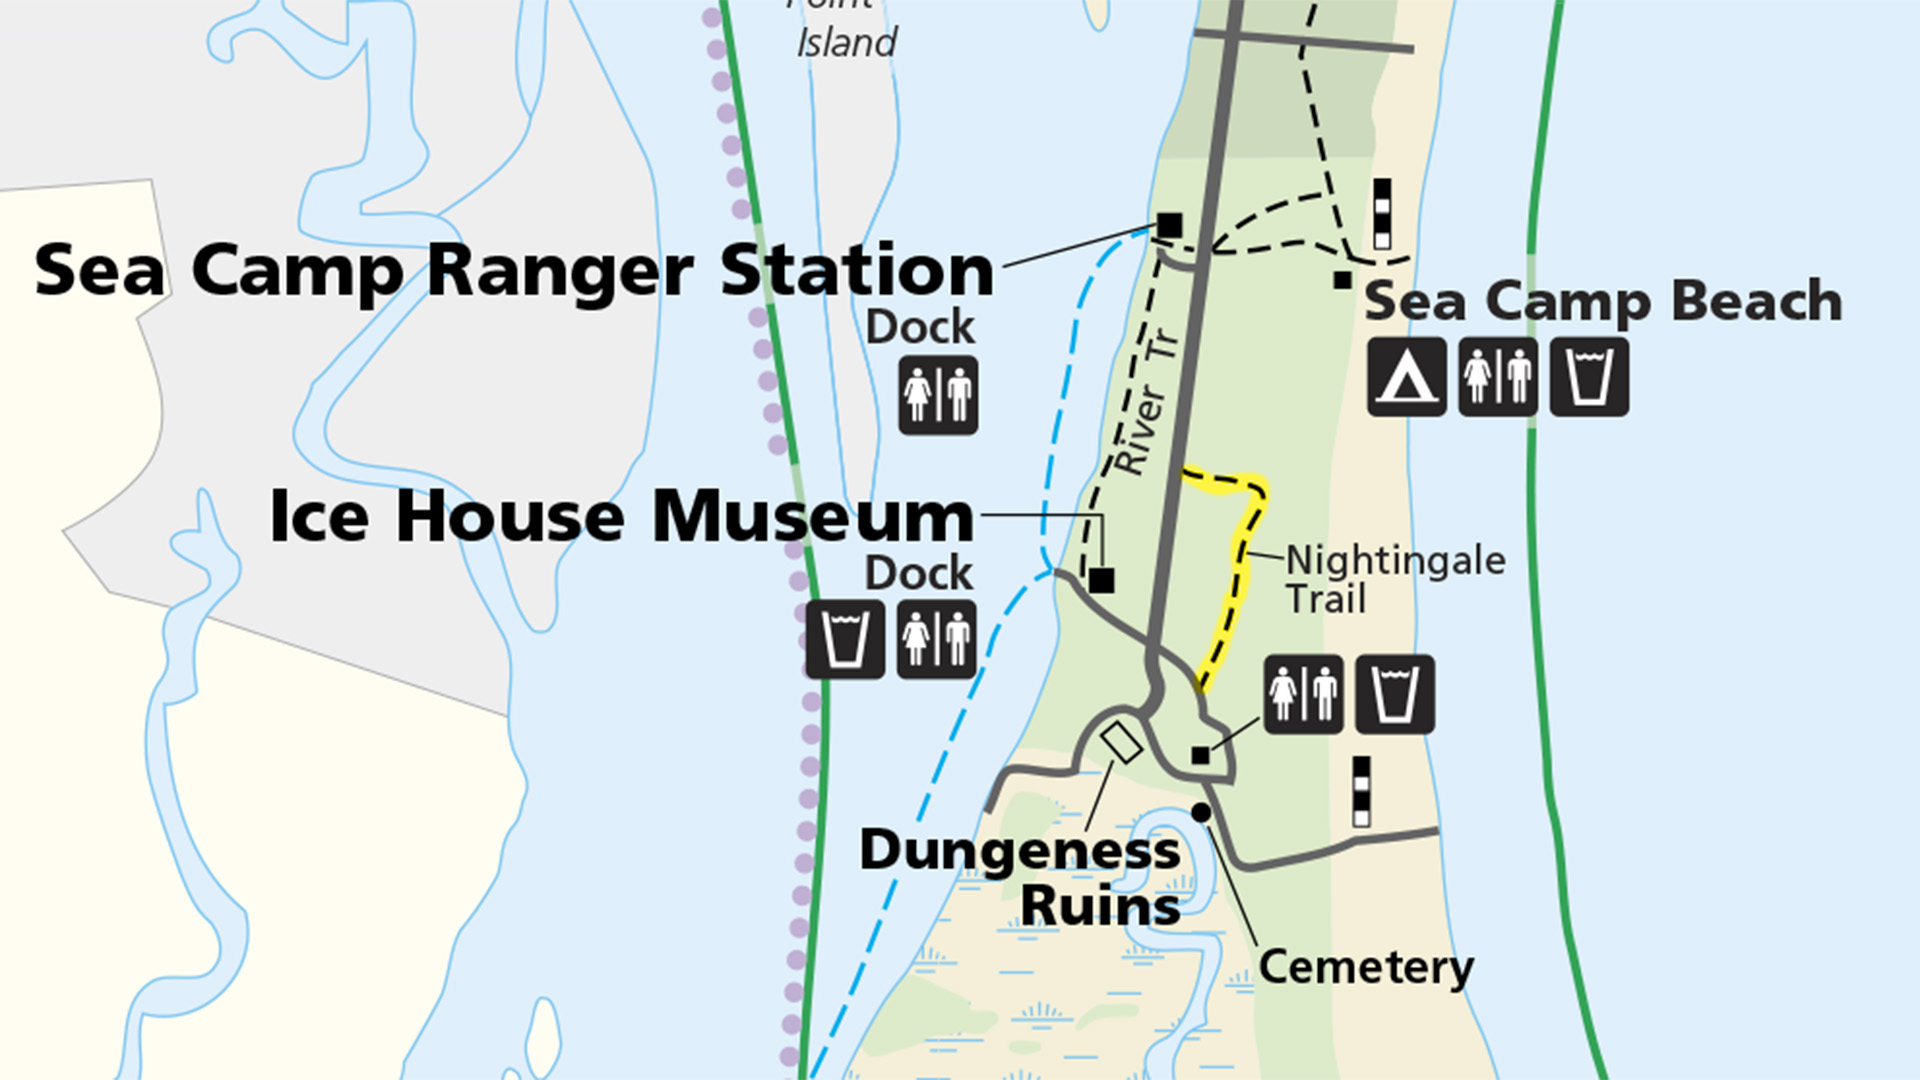 cumberland island national seashore nightingale trail